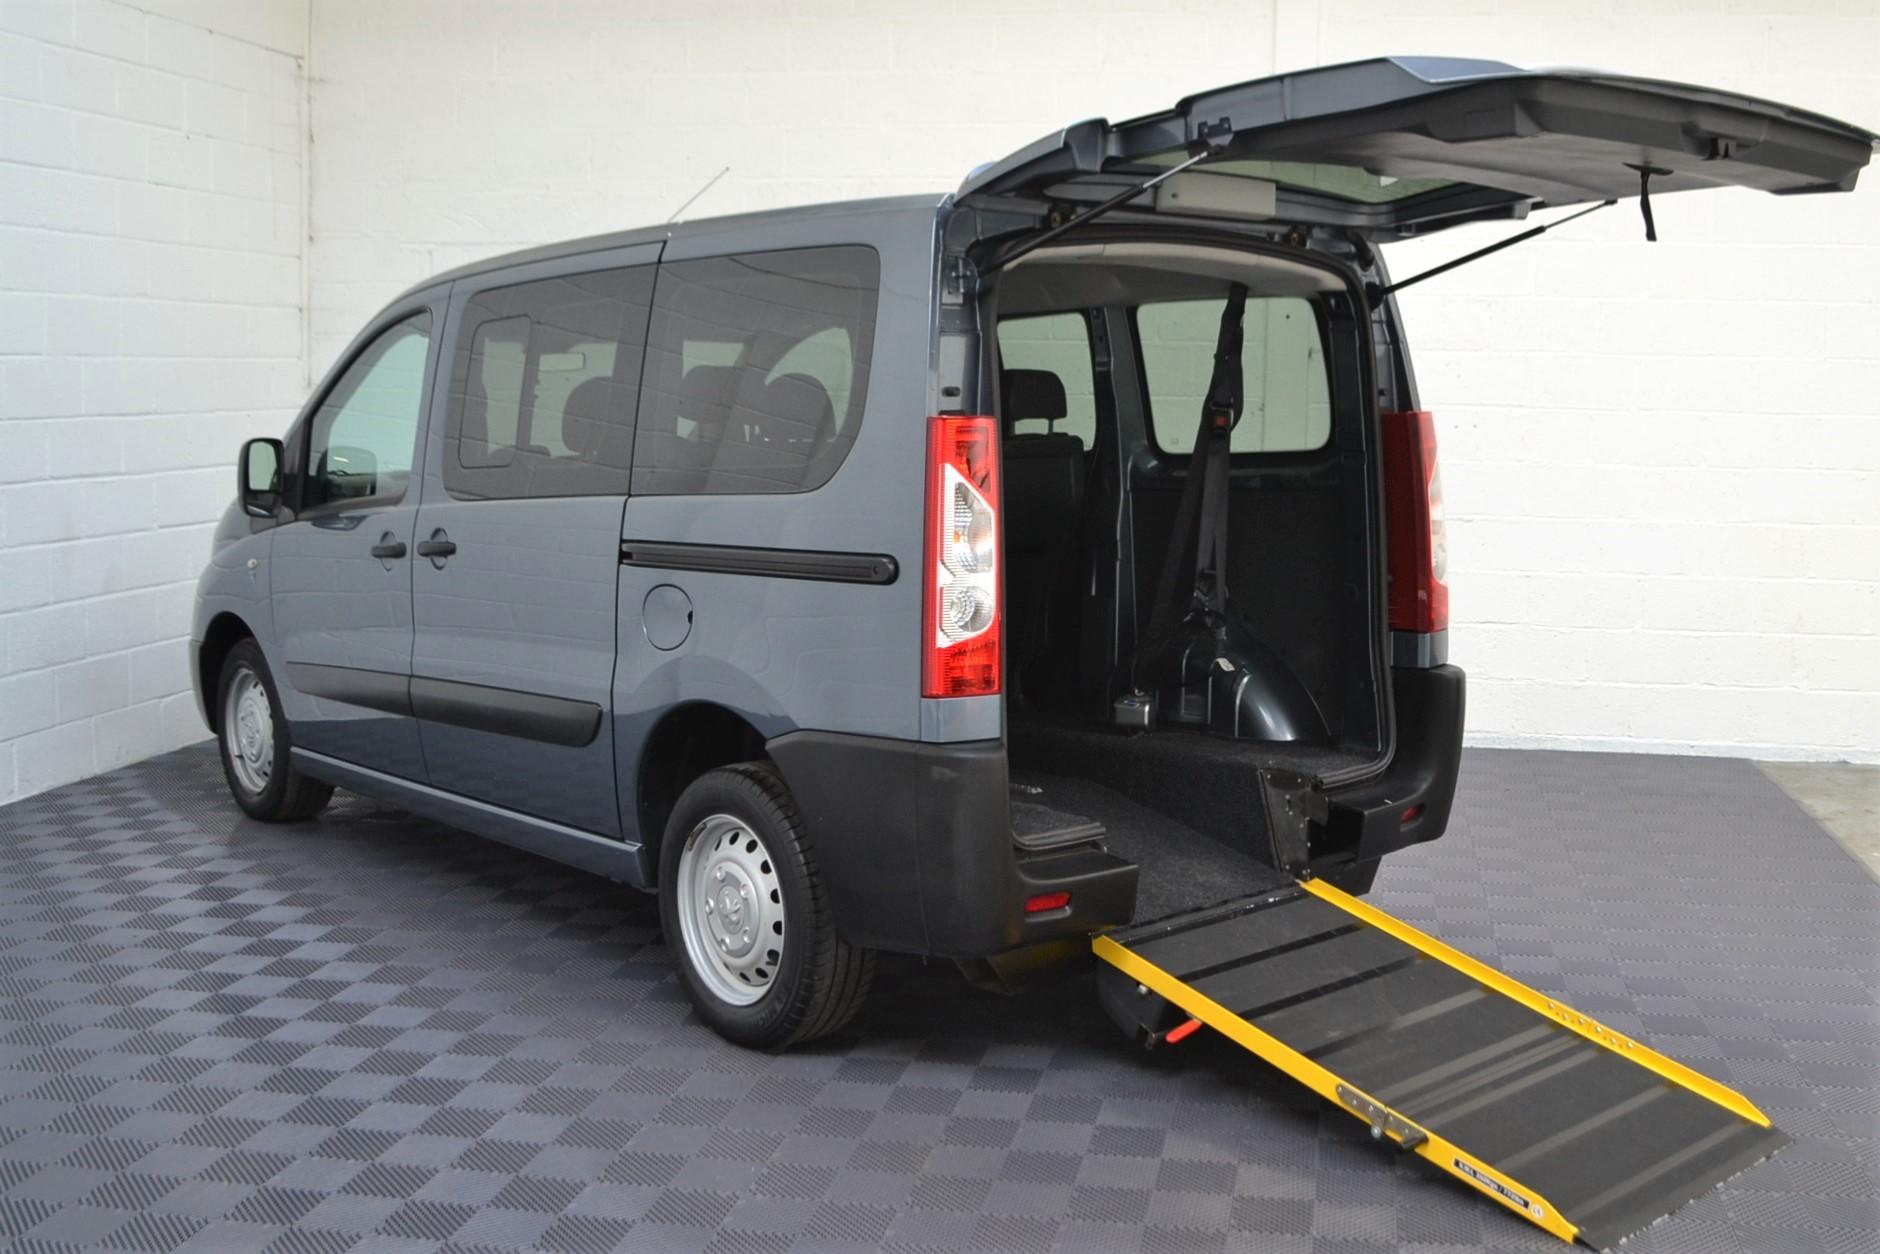 WAV Cars For Sale Bristol Wheelchair Accessible Vehicles Used For Sale Somerset Devon Dorset Bath Peugeot Expert YJ65 JDU 9